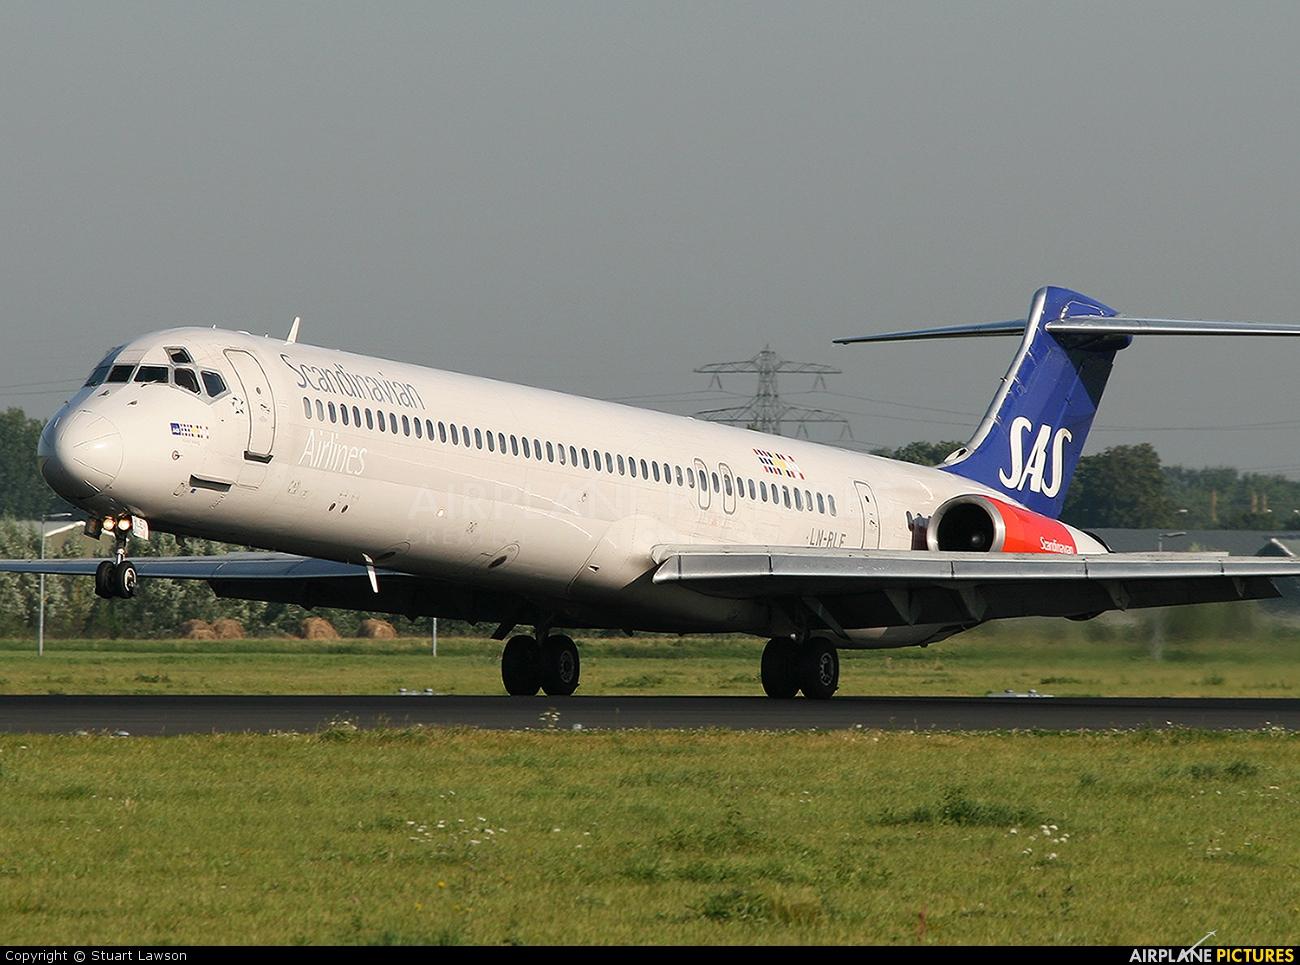 SAS - Scandinavian Airlines LN-RLE aircraft at Amsterdam - Schiphol